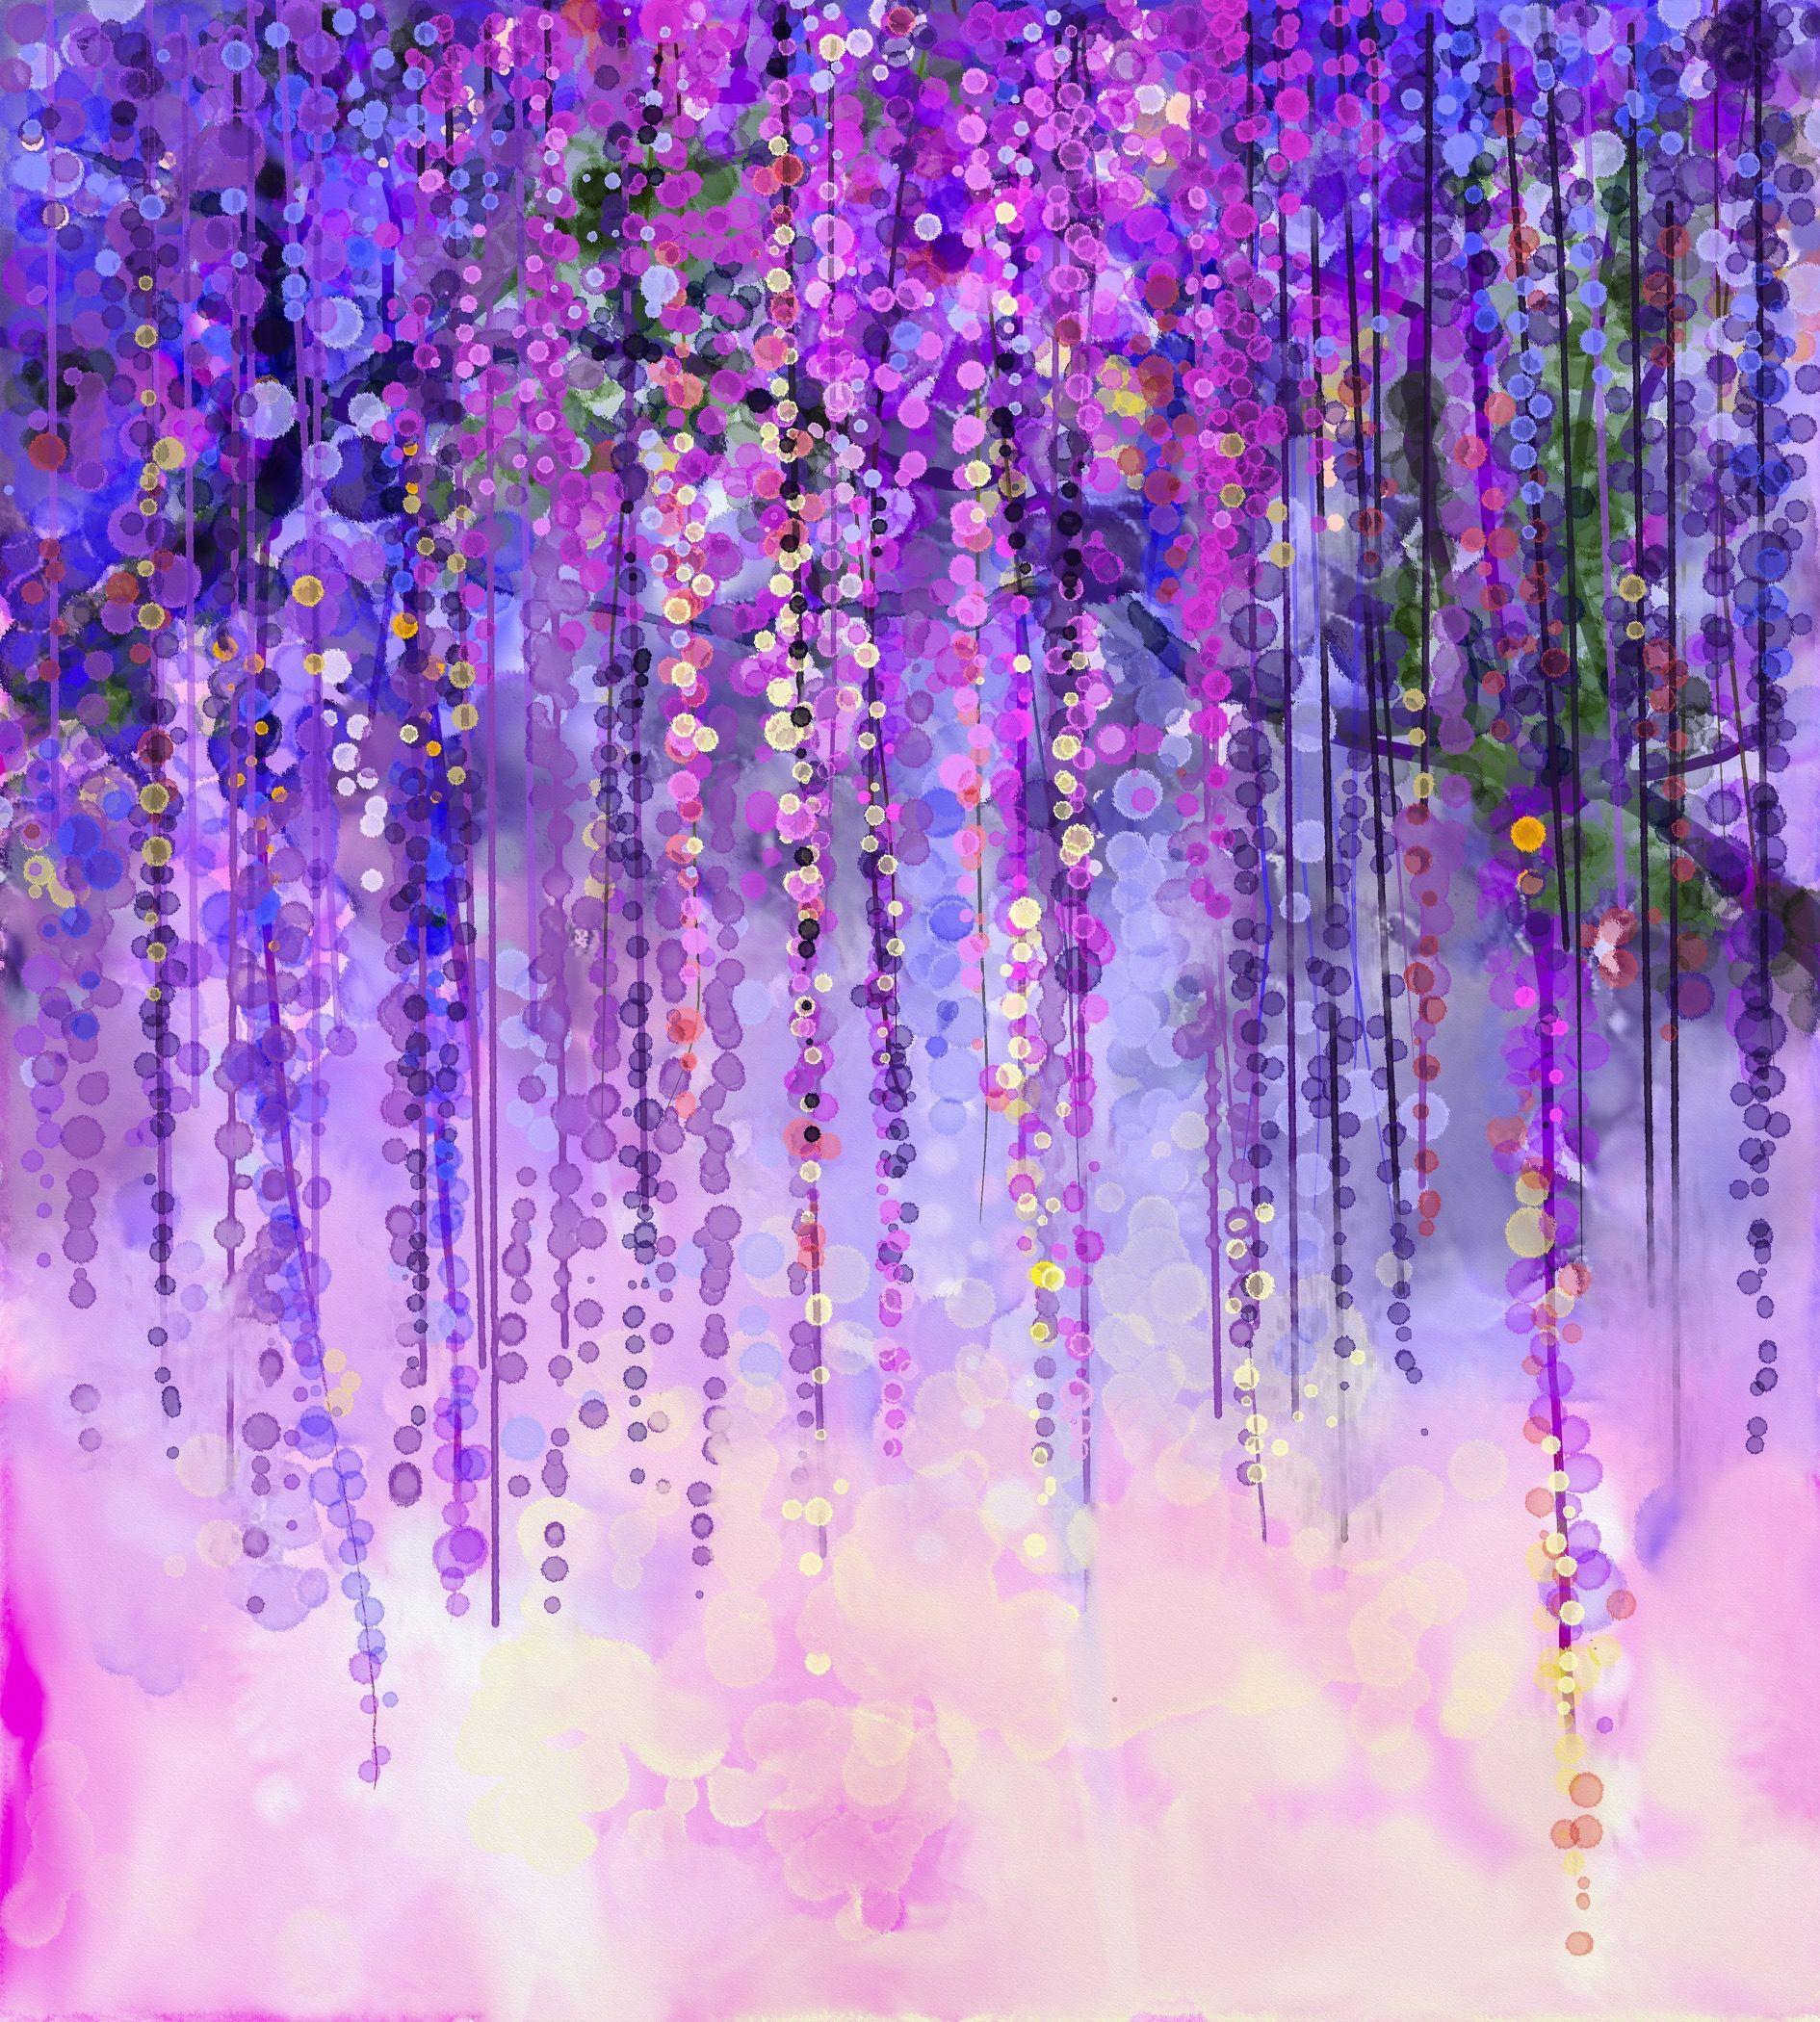 6x8 FT Backdrop Photographers,Rainbow Colored Image with Dark Black Purple Ombre Backdrop Flower Like Swirls Art Background for Kid Baby Artistic Portrait Photo Shoot Studio Props Video Drape